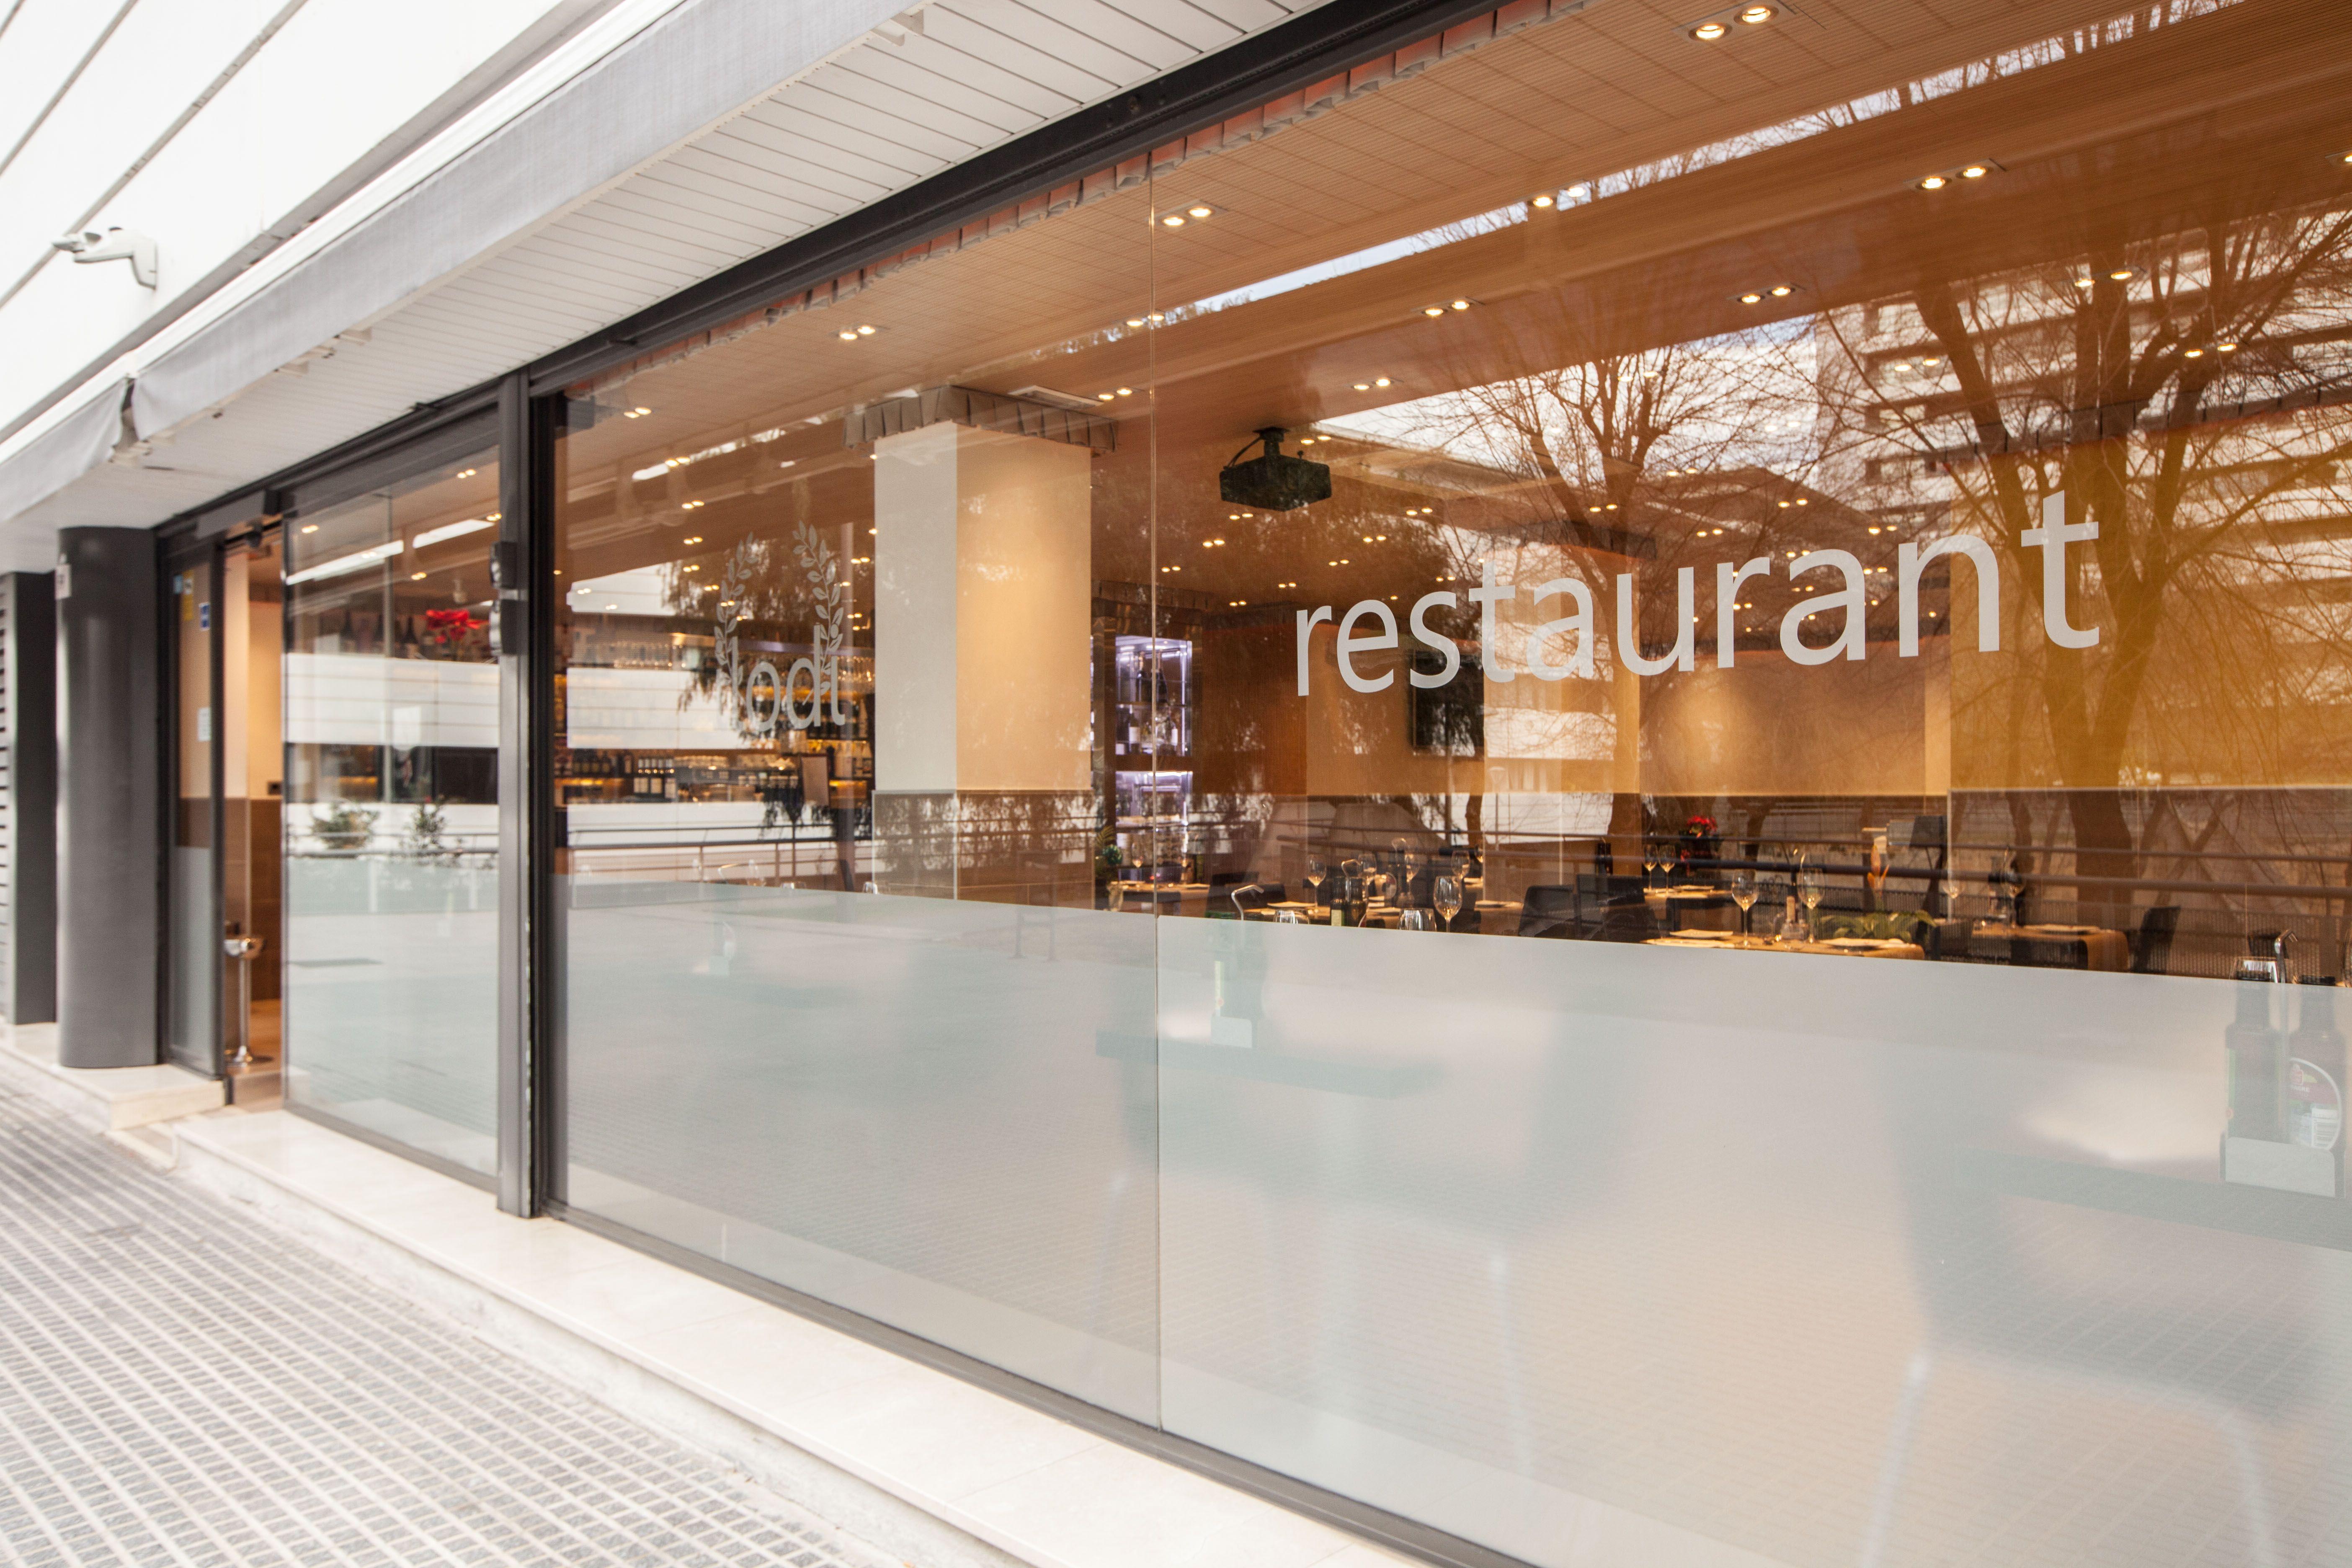 Foto 1 de Restaurante en Barcelona | Restaurante Ilodi